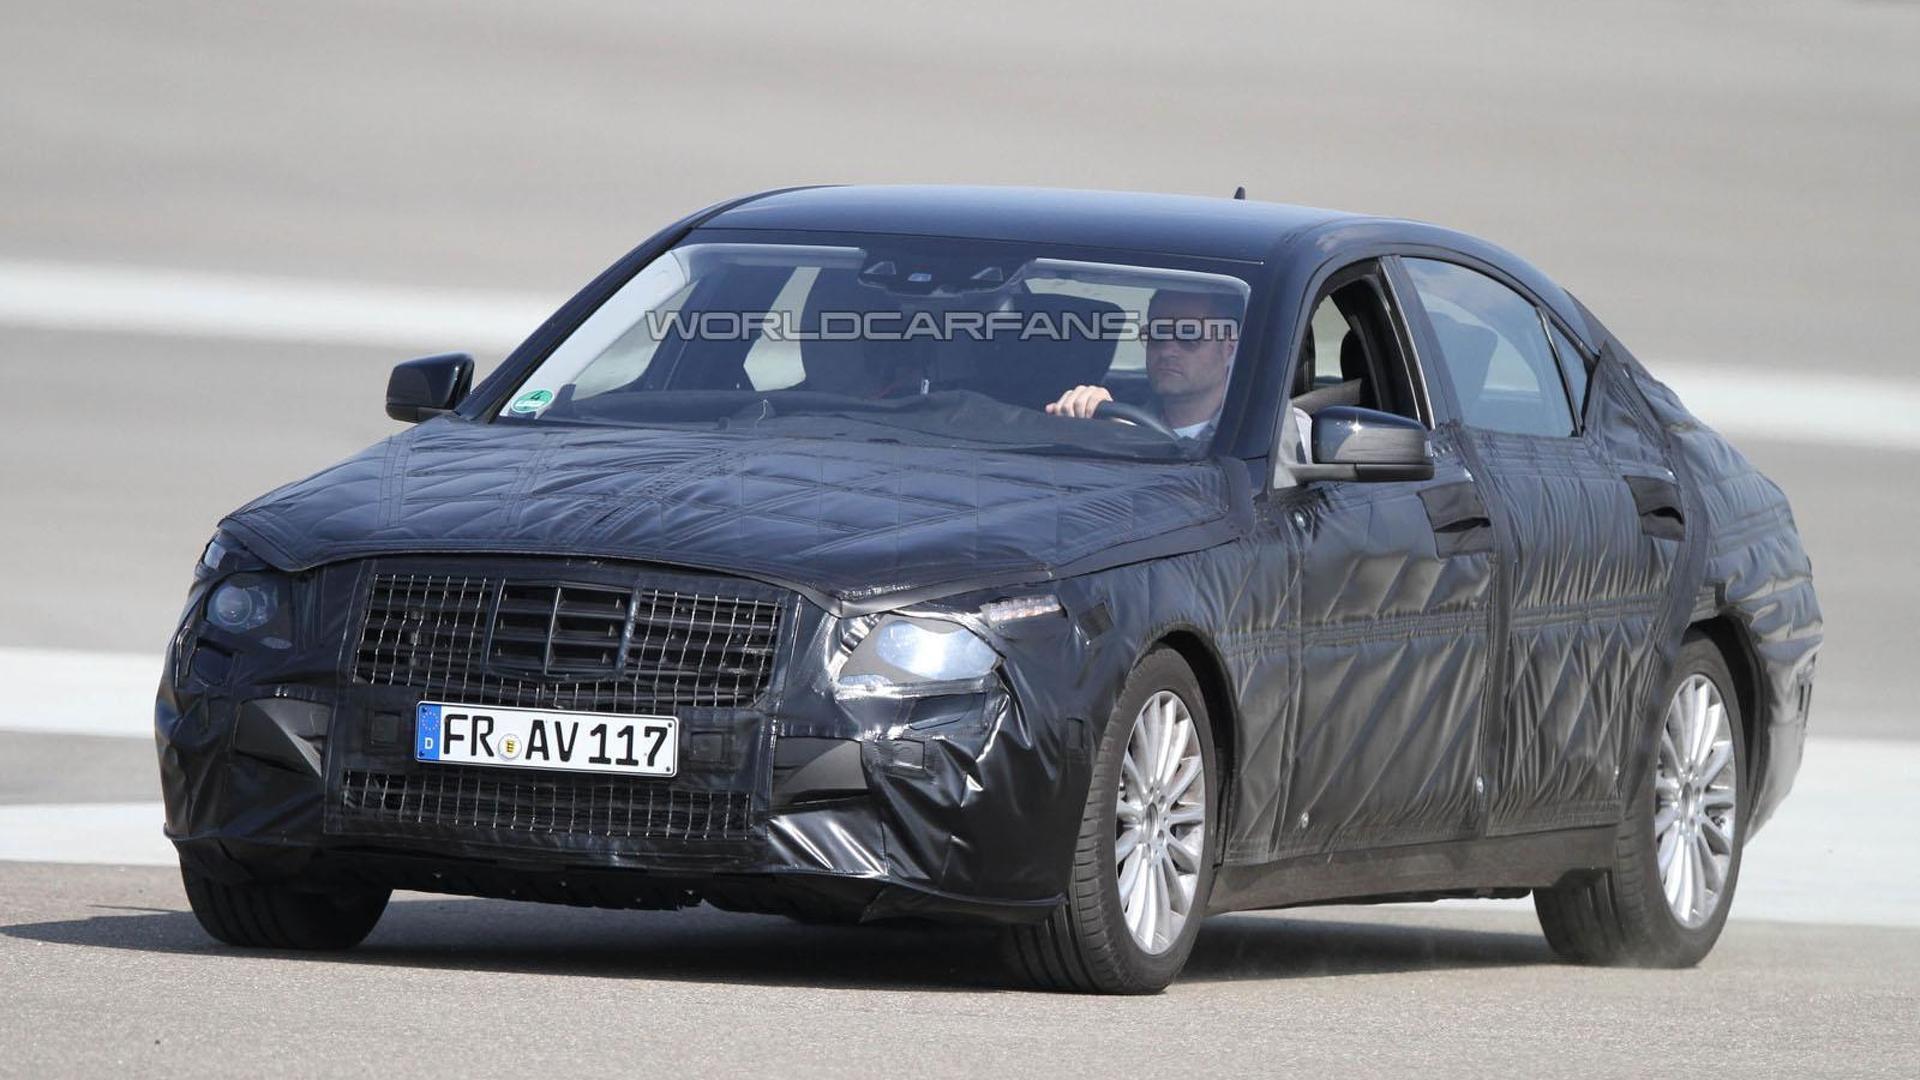 2013 Mercedes-Benz S-Class comes into focus